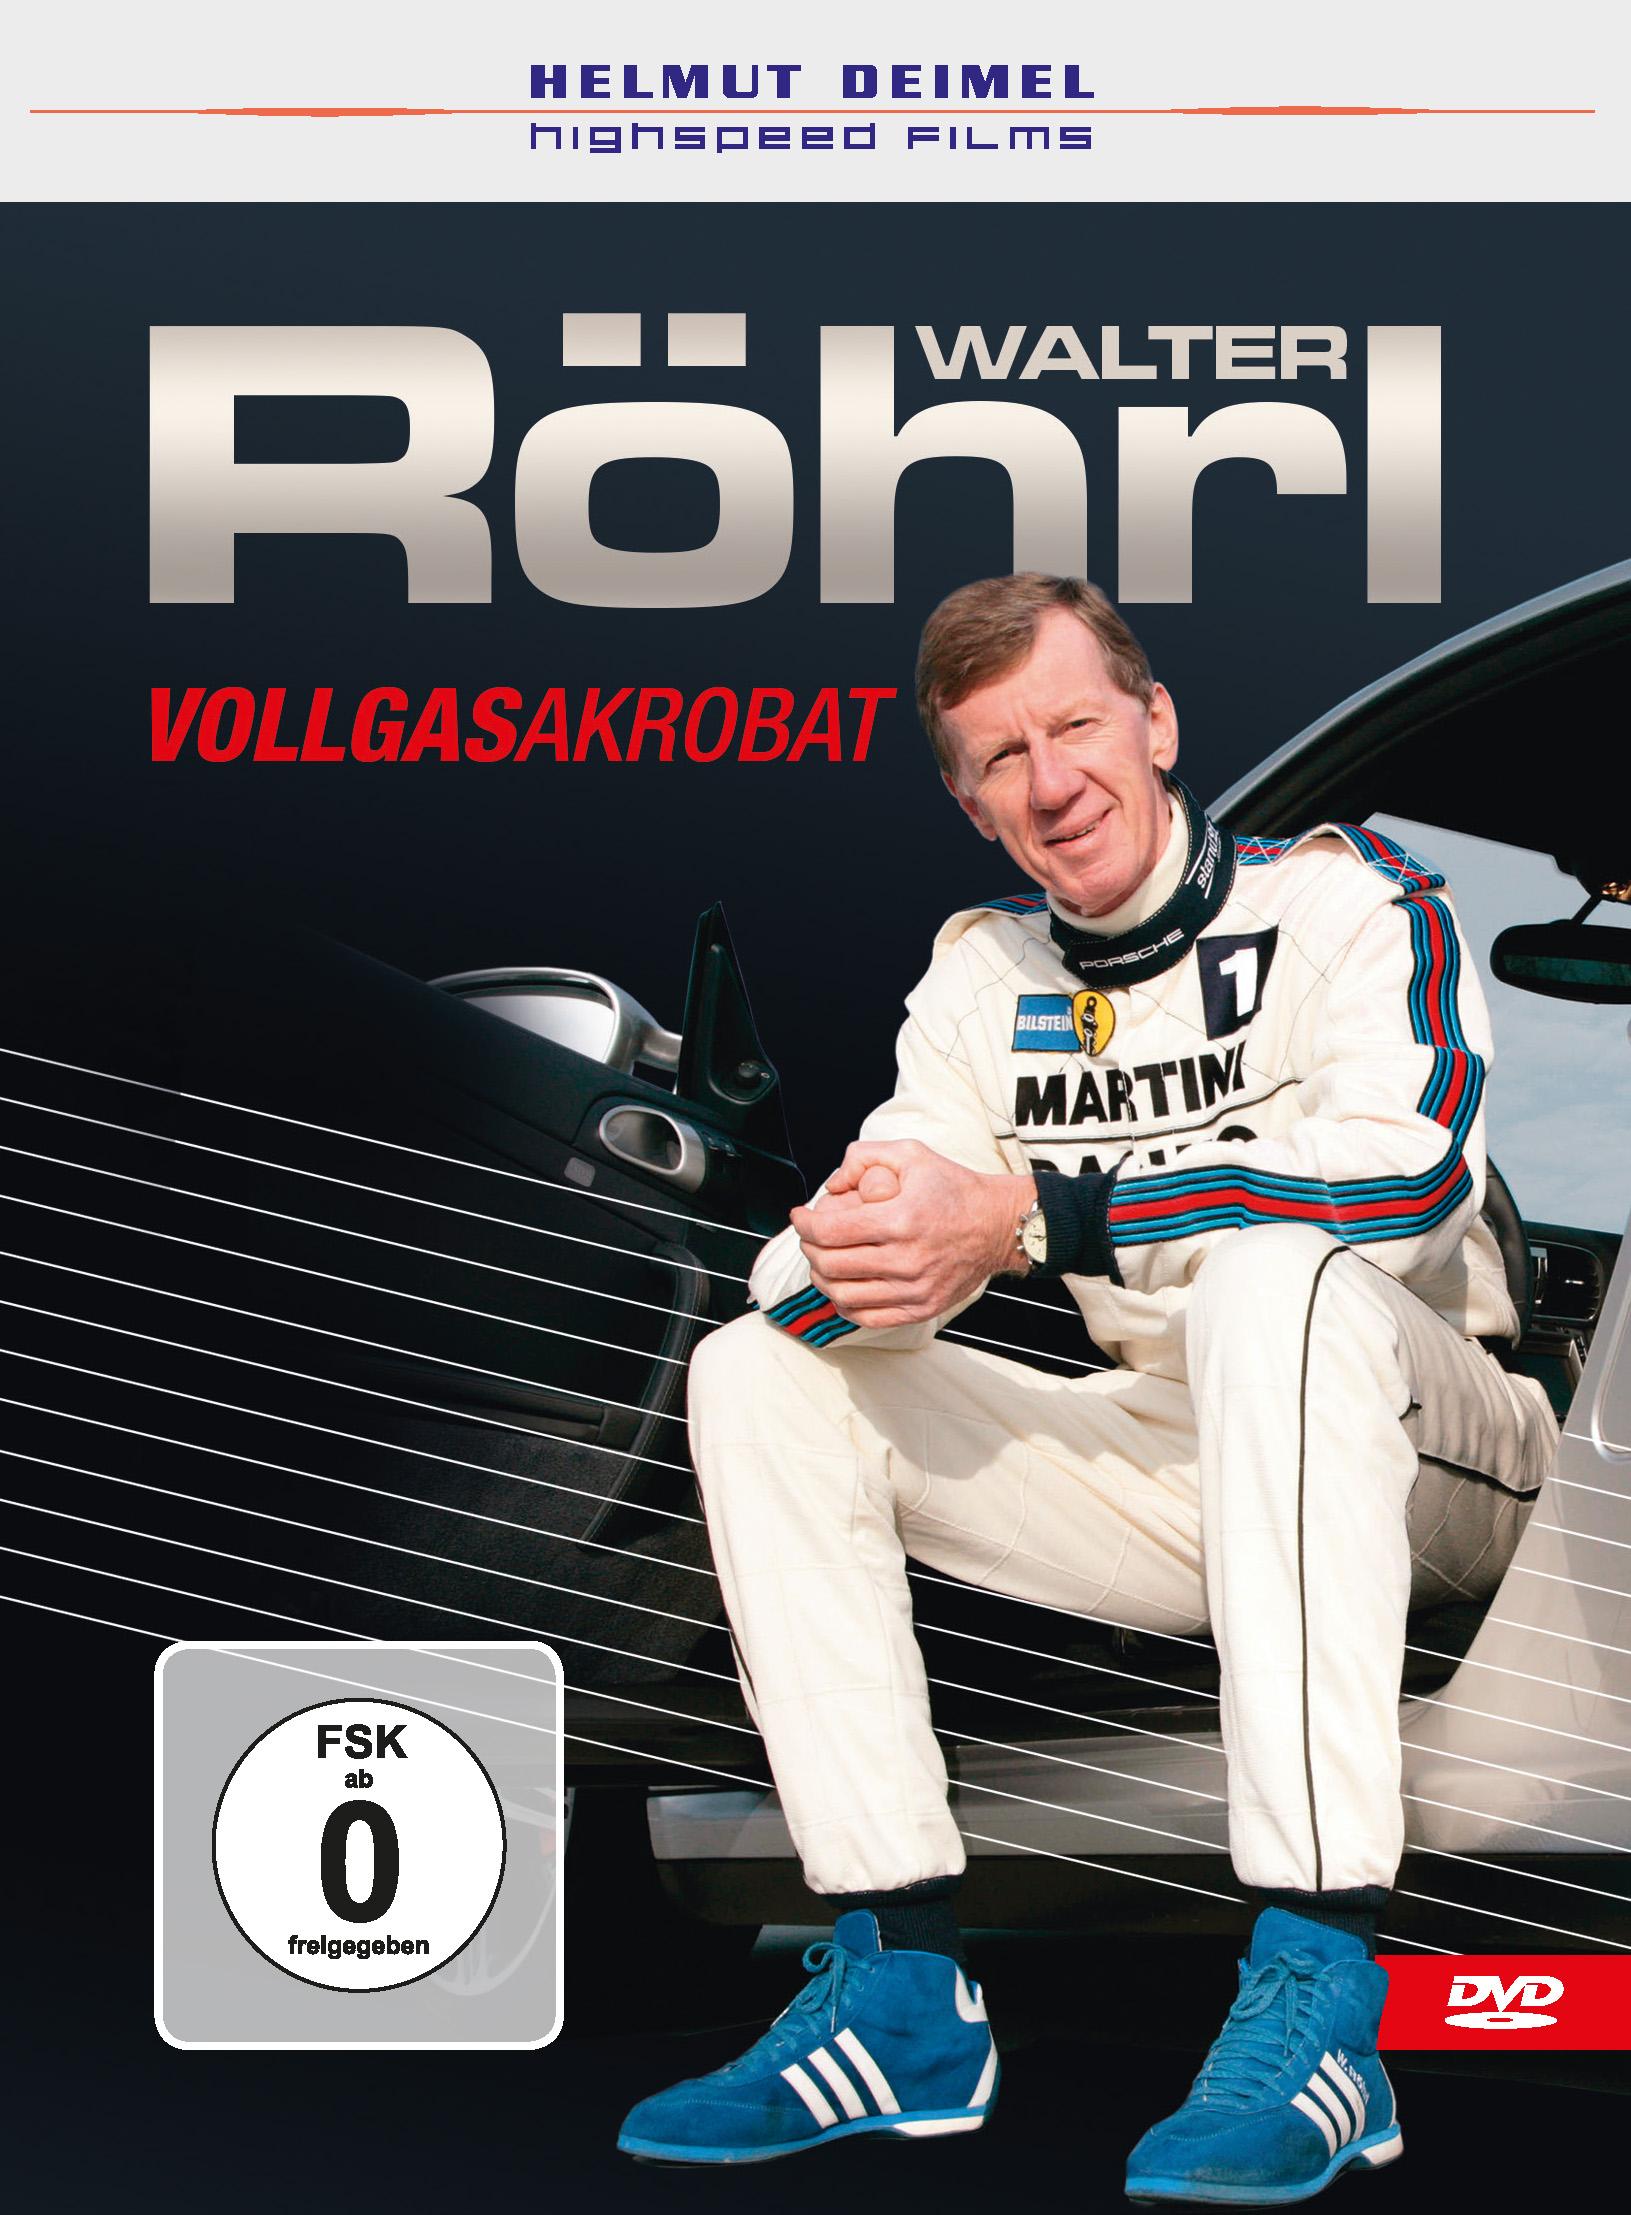 Mega-DVD+Kalender Bundle 2022 - Vollgasakrobat